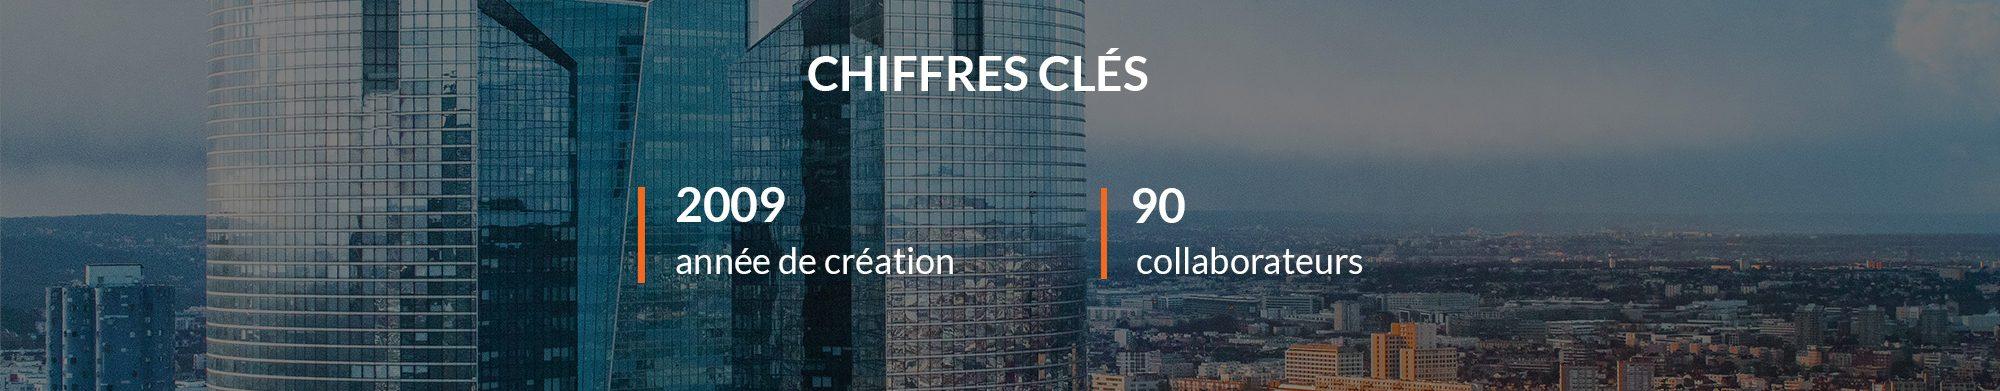 Chiffres-clés-Lendys-France-v2